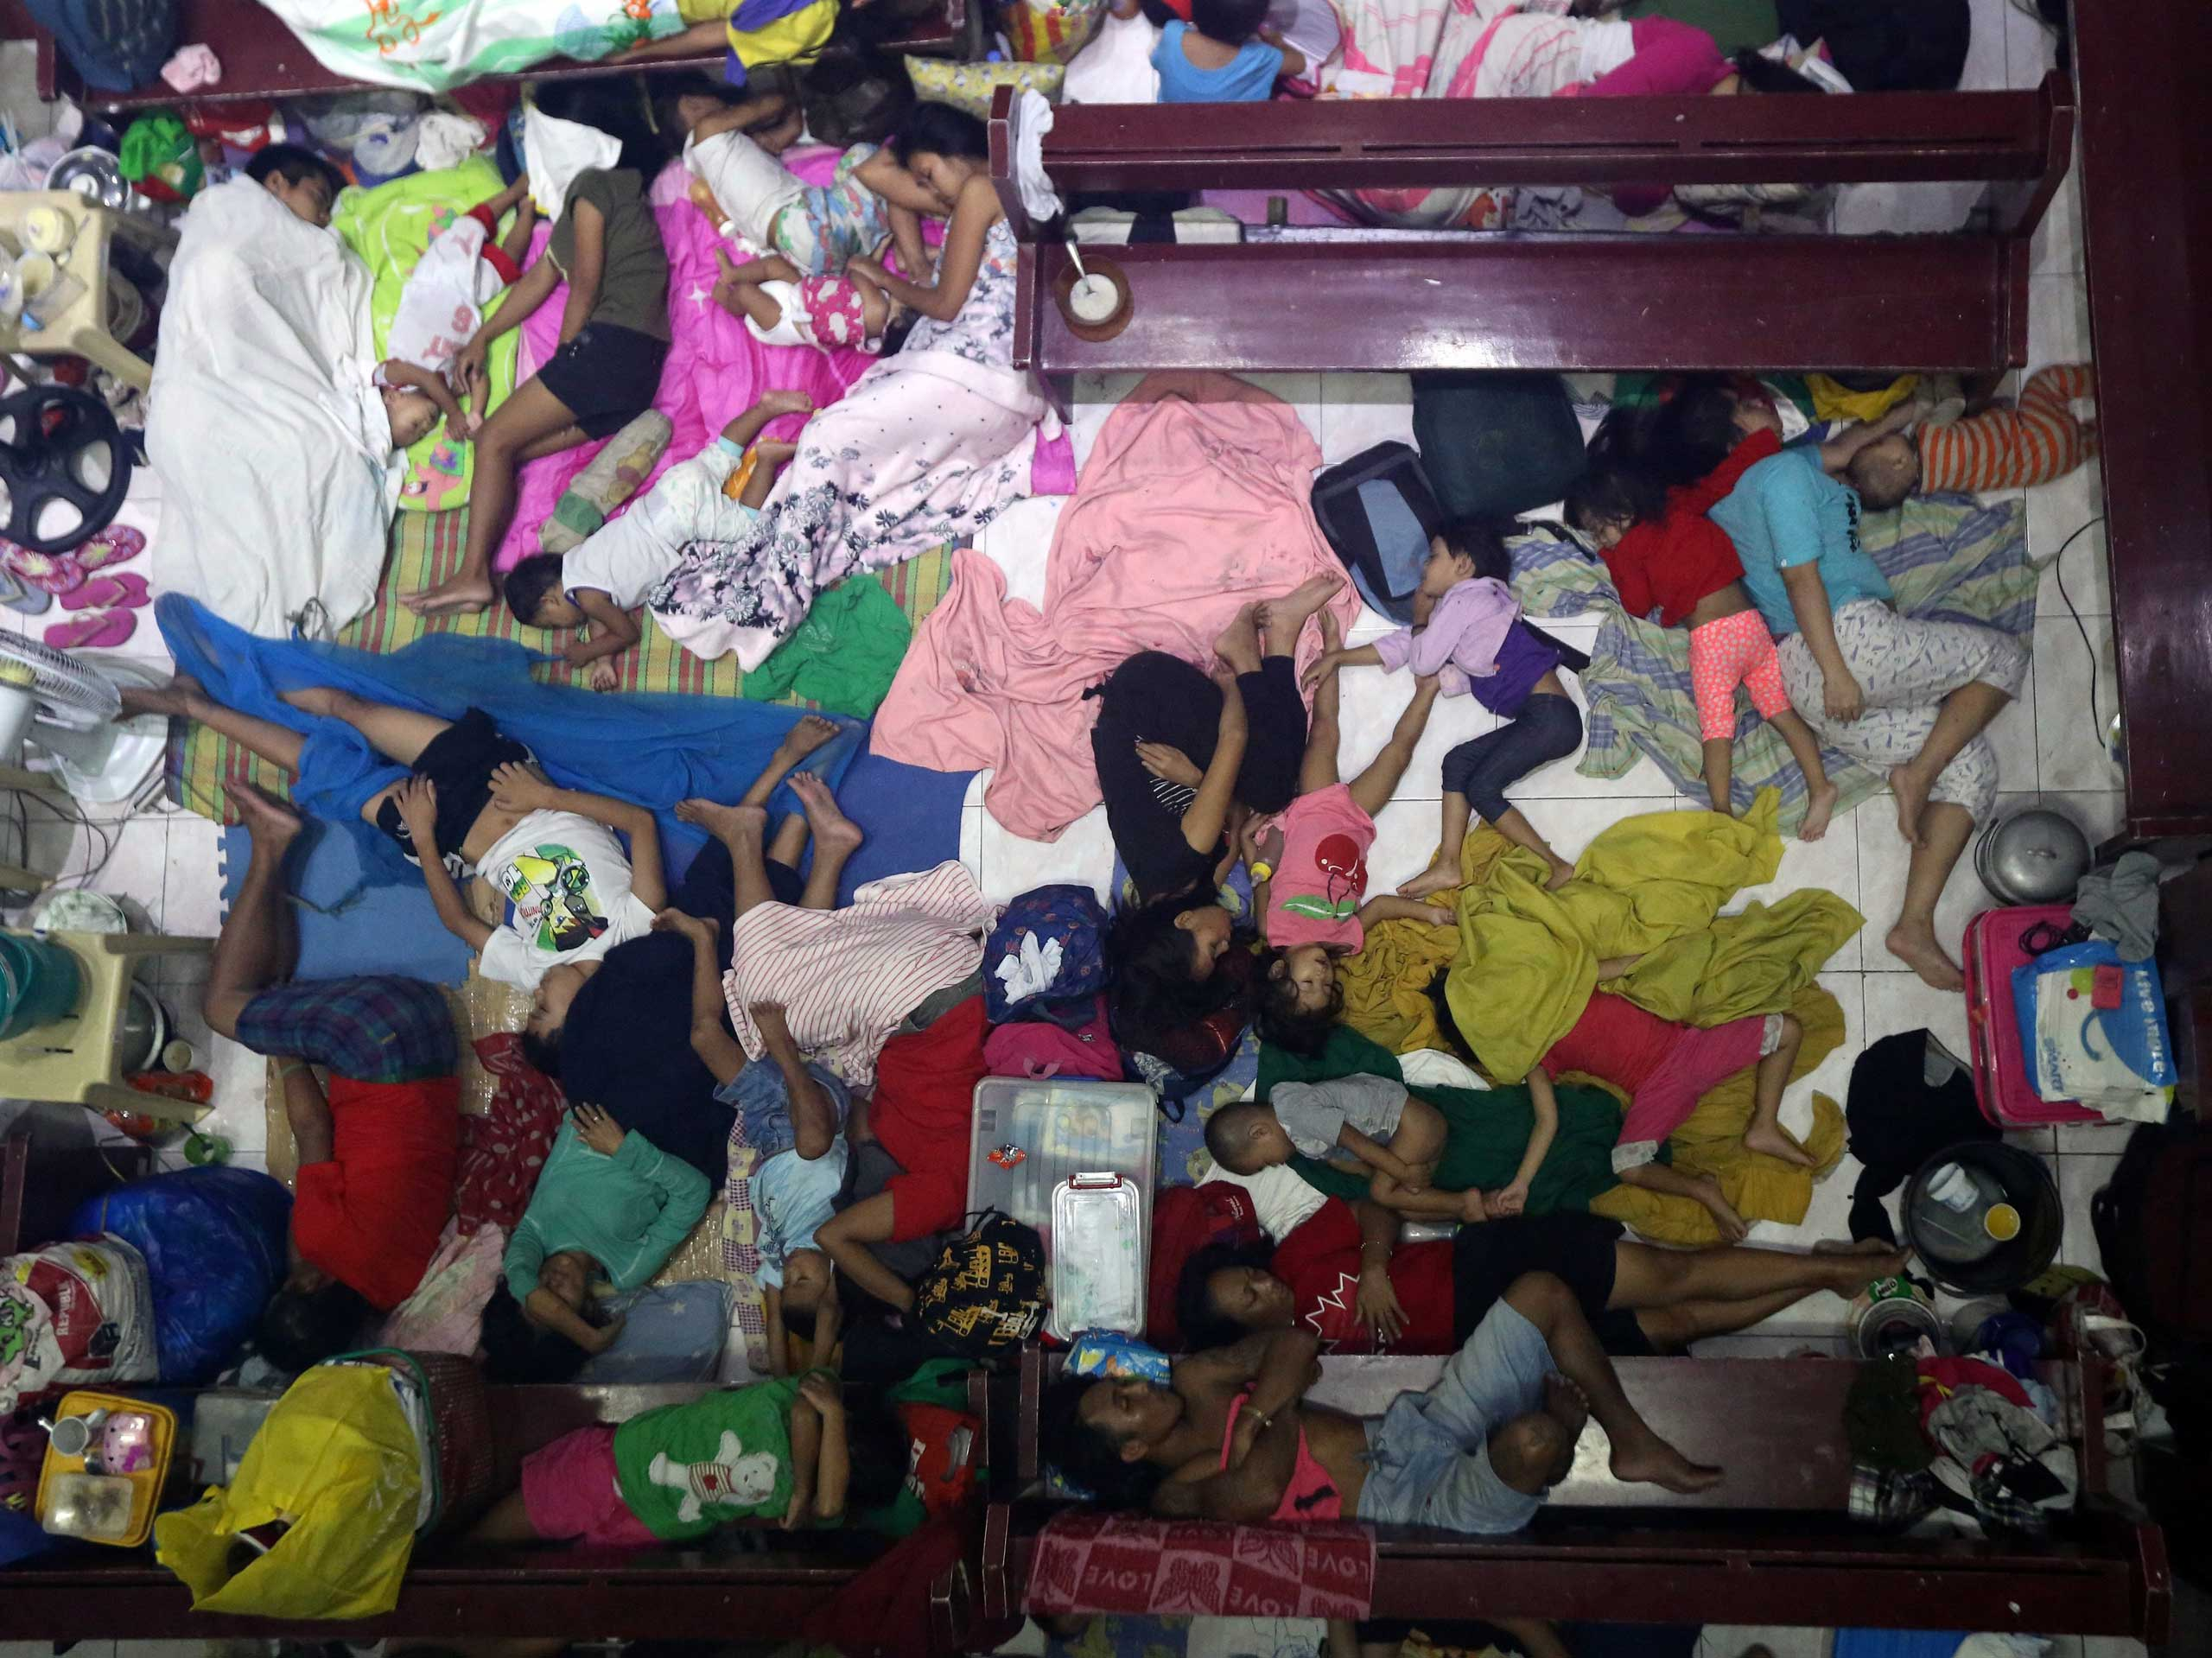 Sept. 20, 2014. Filipino flood victims rest inside a church turned into a temporary evacuation center in Marikina city, east of Manila, Philippines.